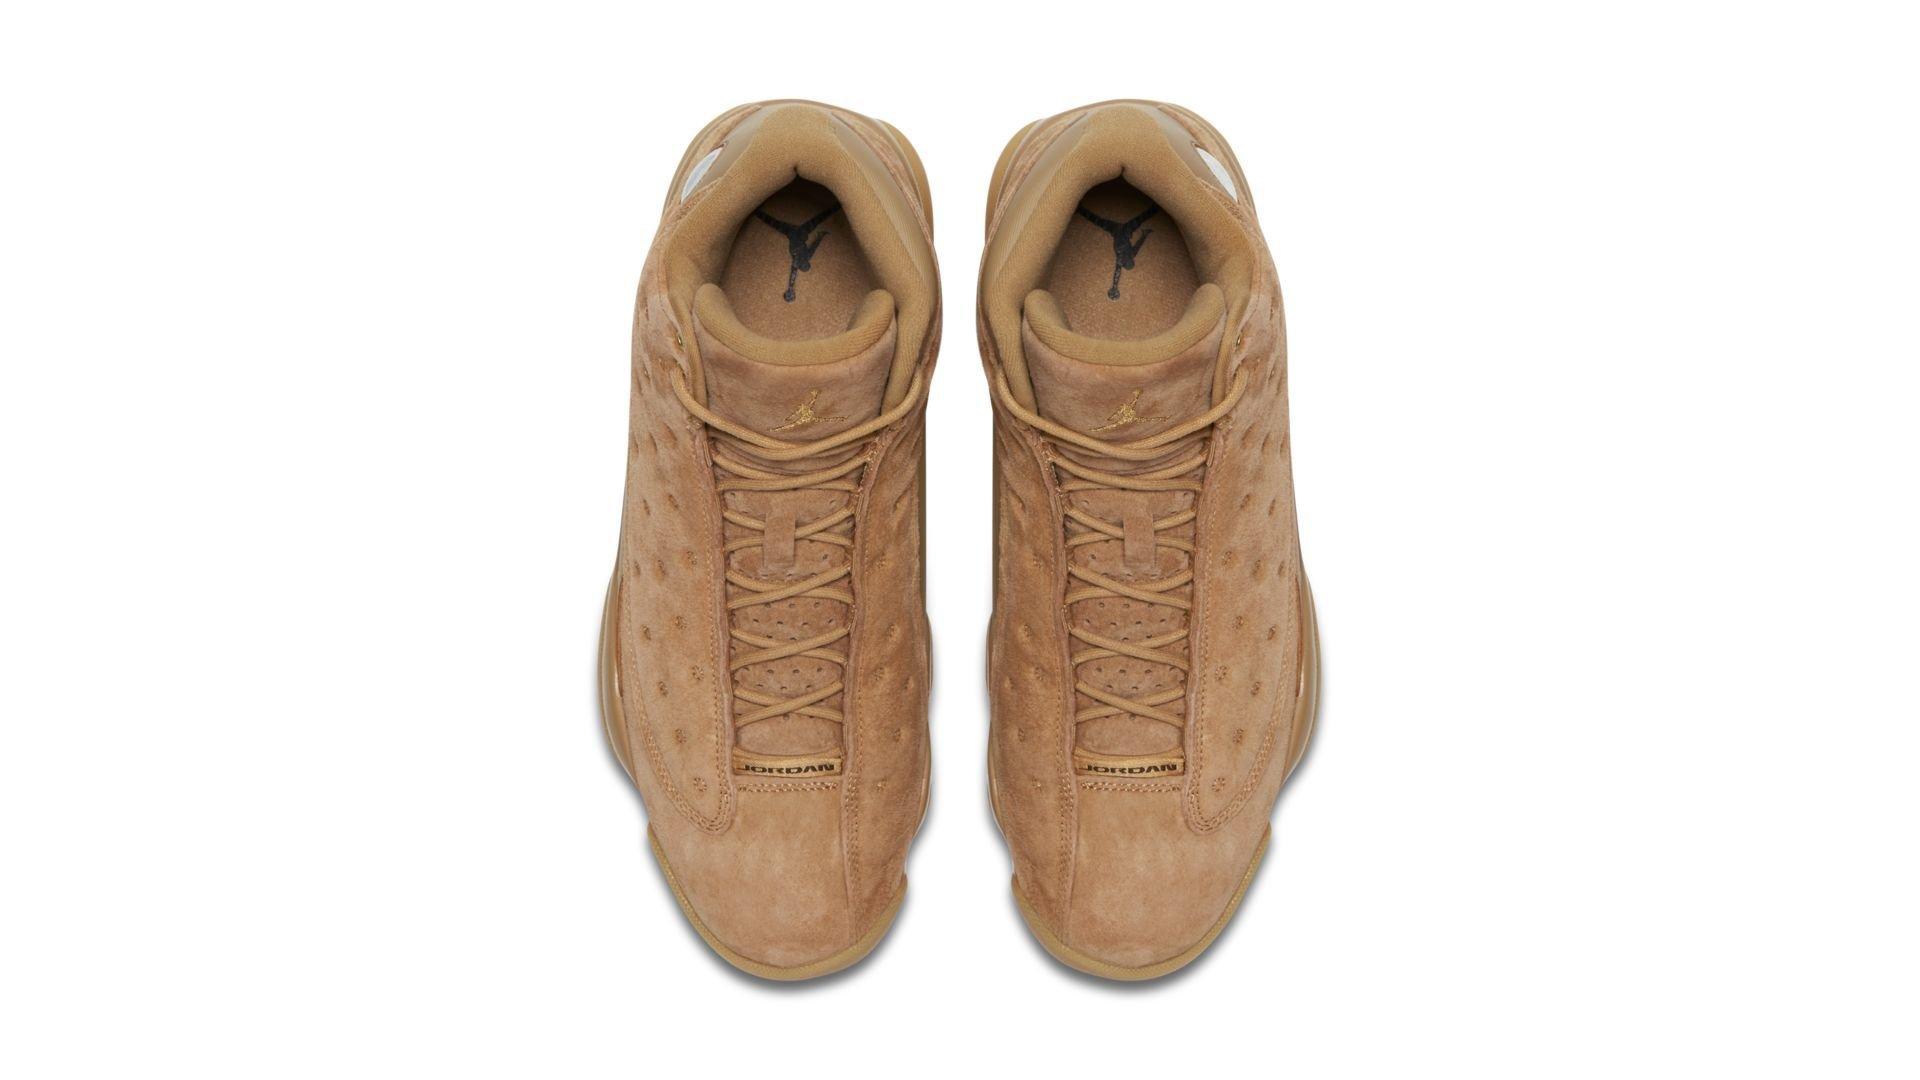 Jordan 13 Retro Wheat (414571-705)